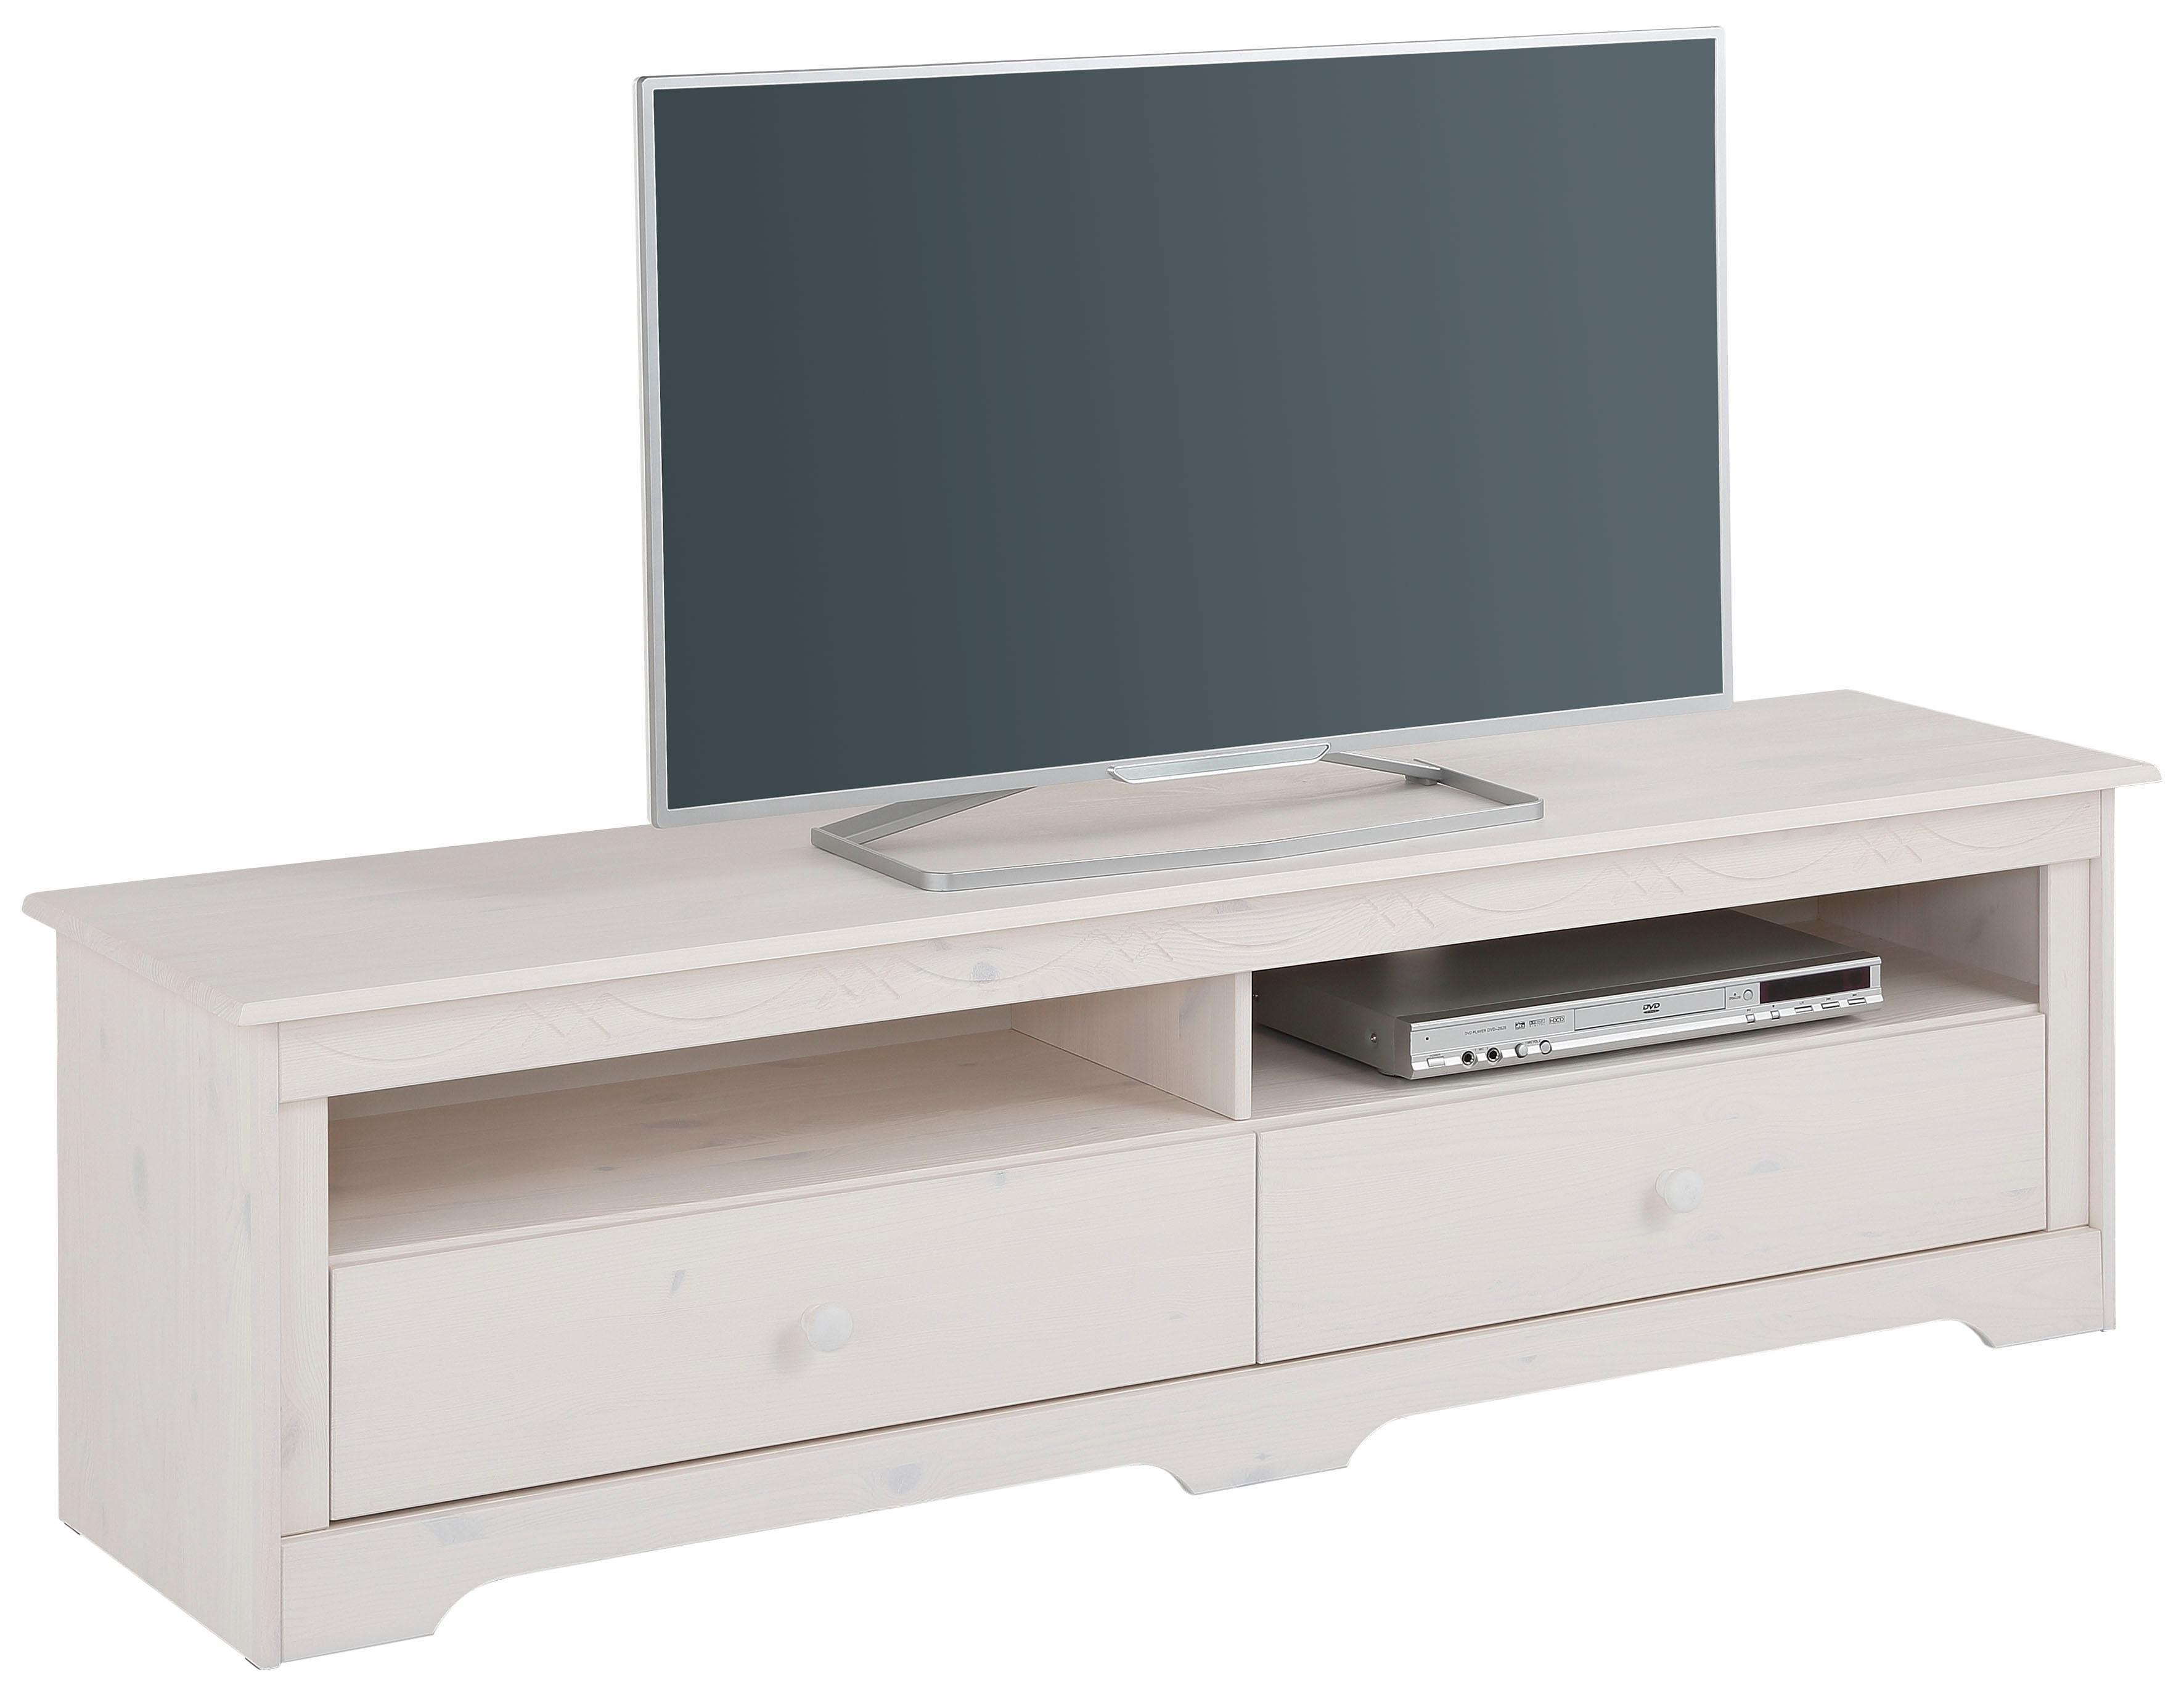 Home affaire tv-meubel »Sofia« bij OTTO online kopen